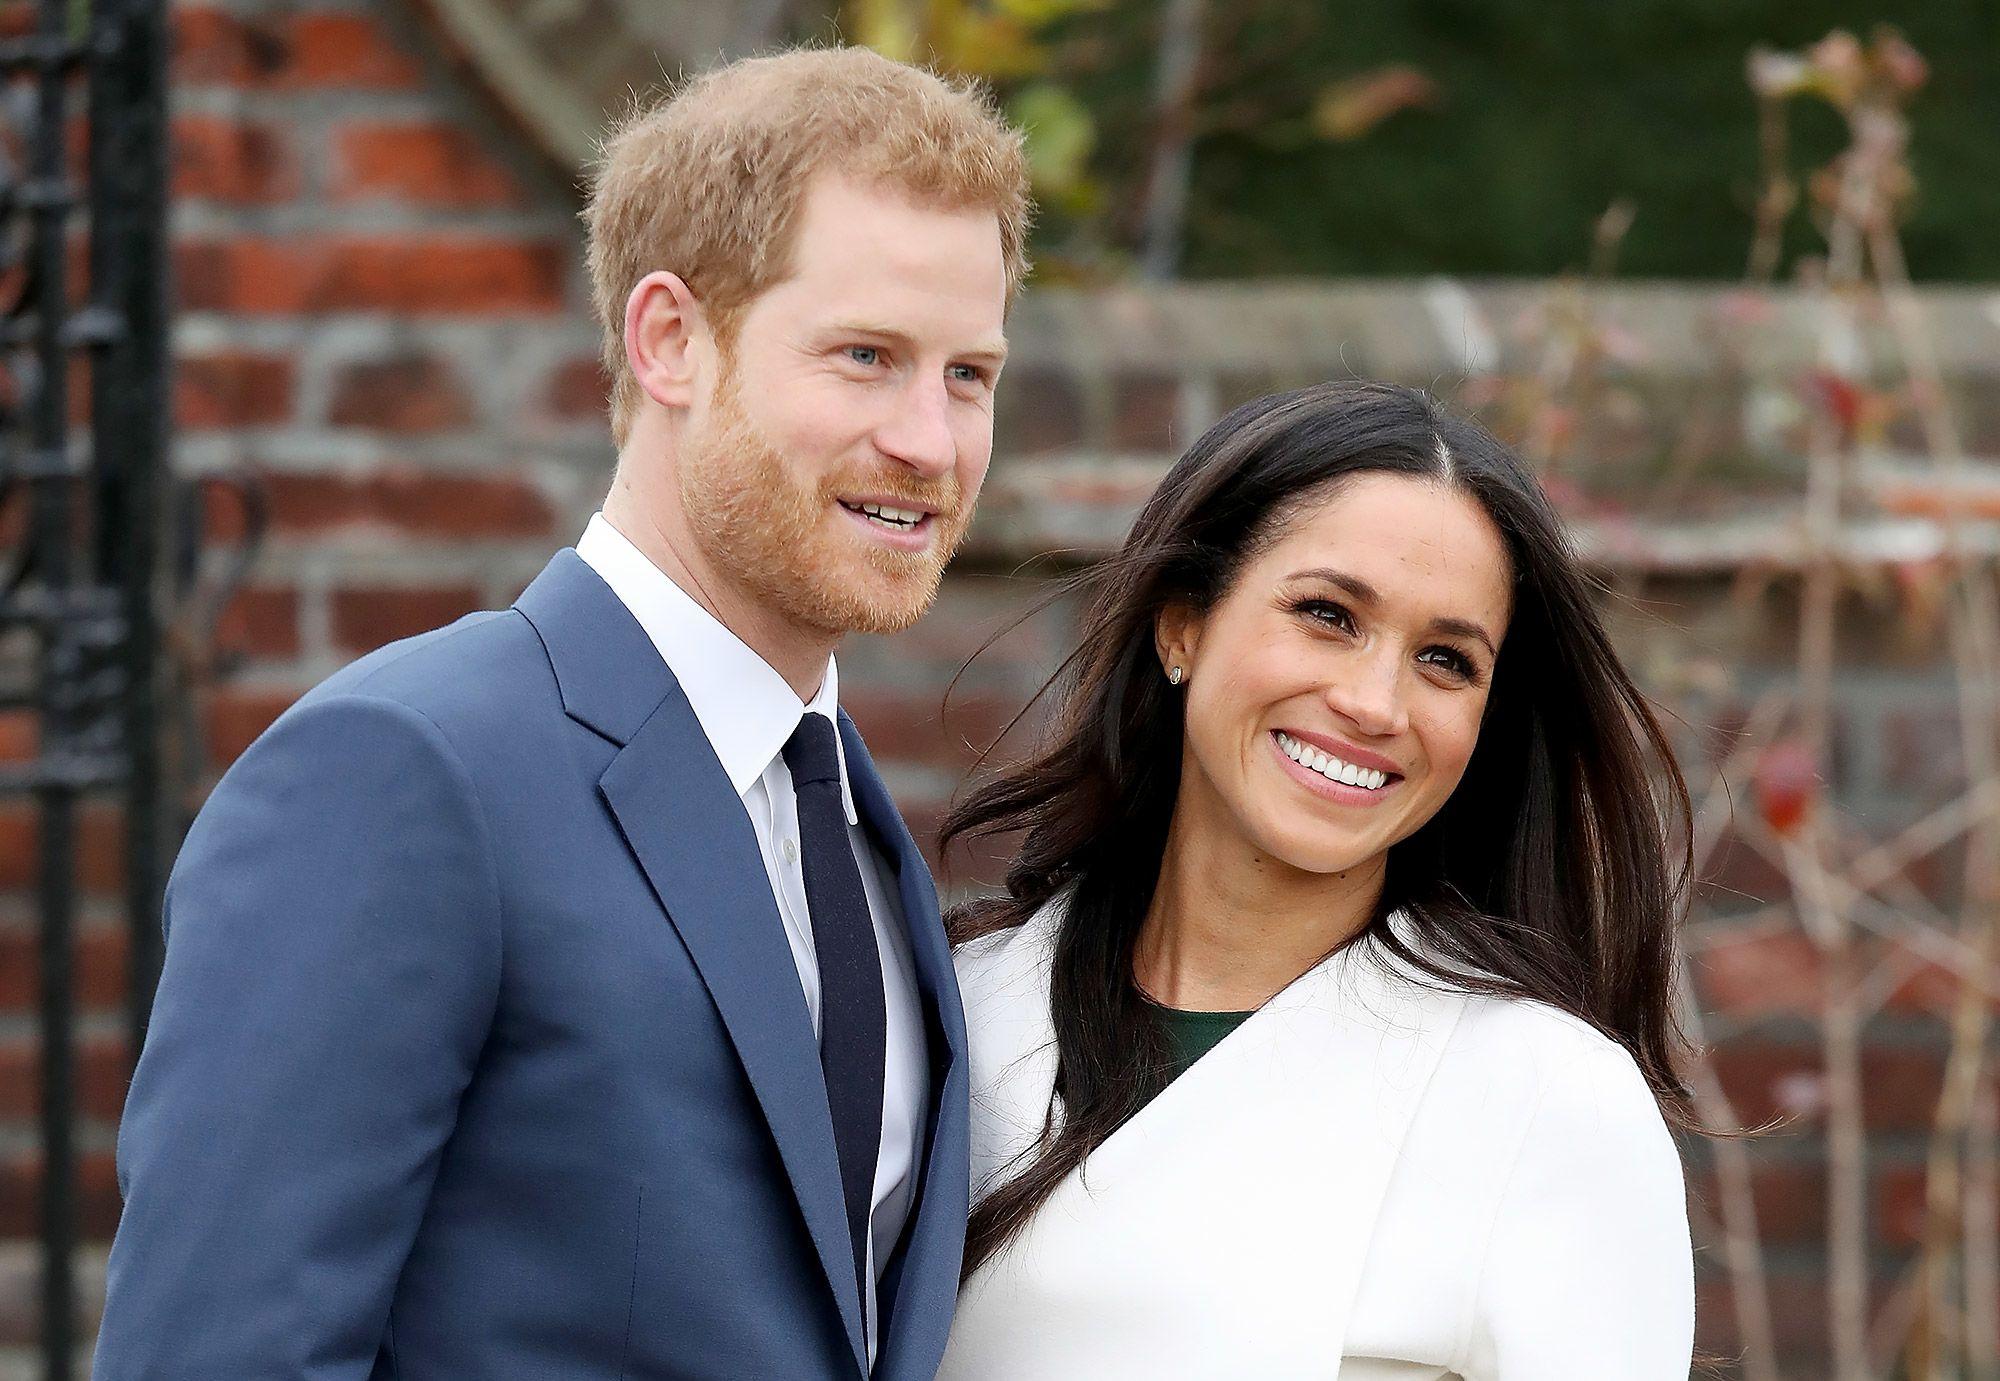 Resmi Menikah, Ini Kisah Romansa Meghan Markle Pangeran Harry